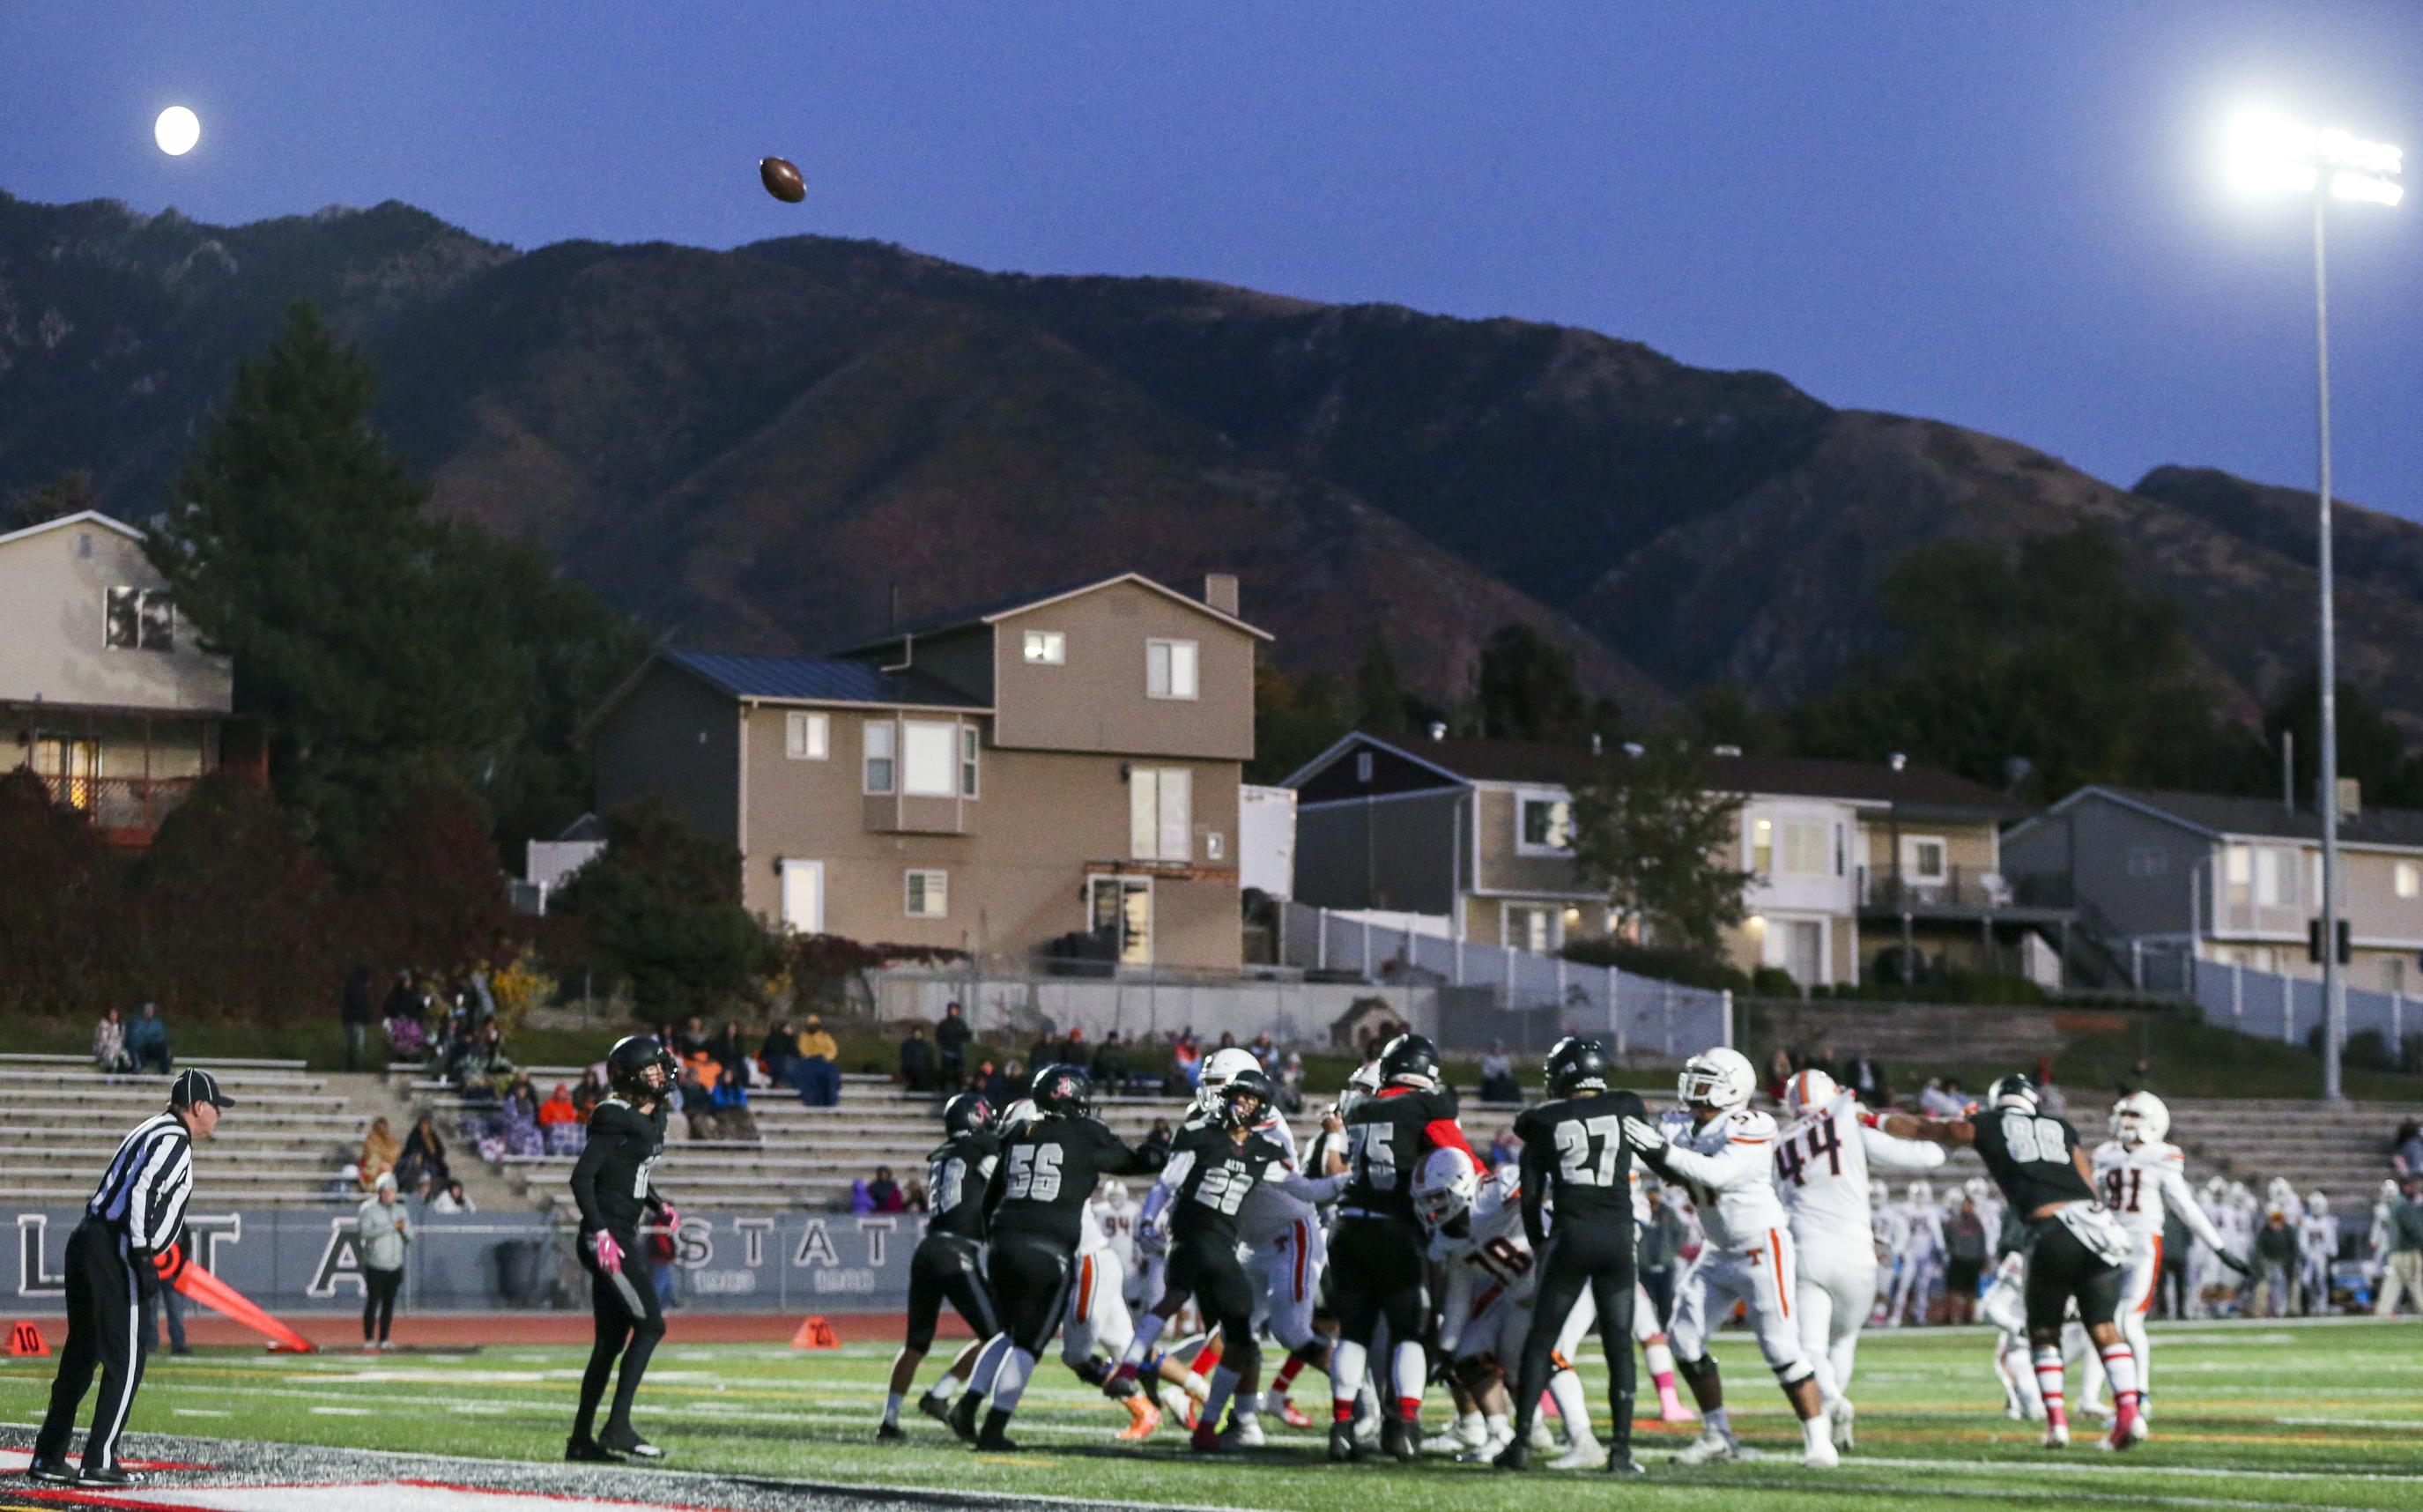 Alta High School hosts Timpview High School during a high school football game at Alta High School in Sandy on Thursday, Oct. 10, 2019.